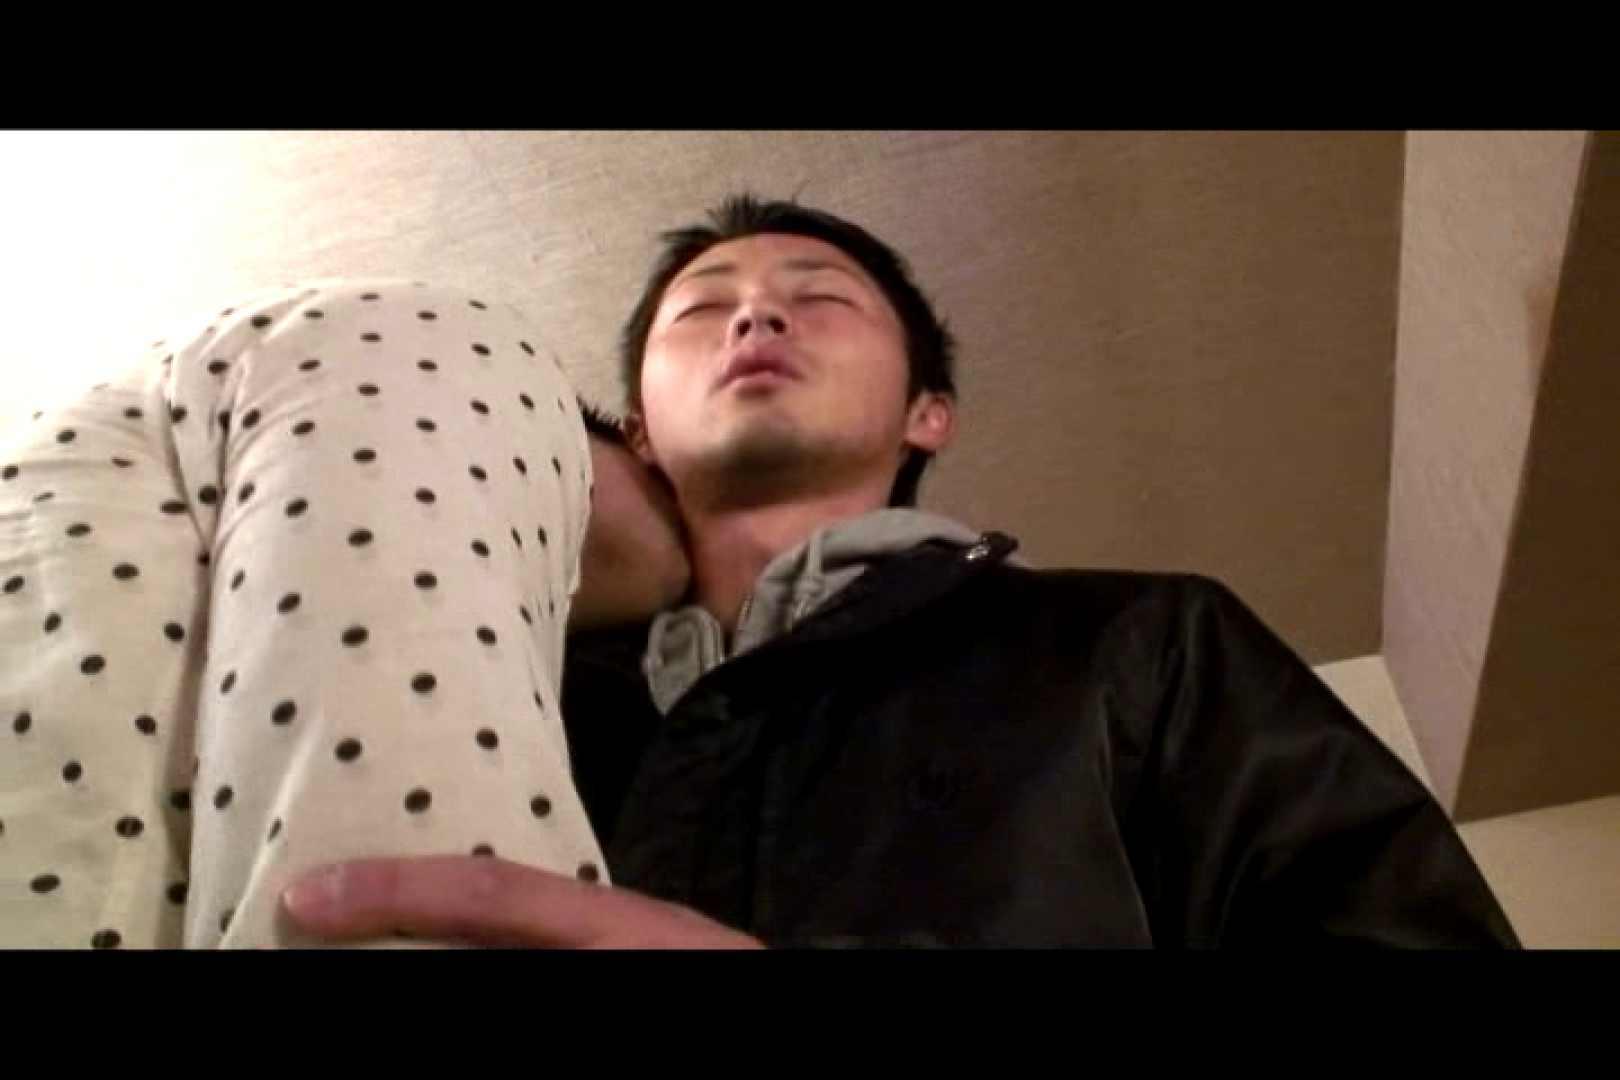 Bistro「イケメン」~Mokkori和風仕立て~vol.01 ゲイのプレイ | イケメンたち  97枚 33